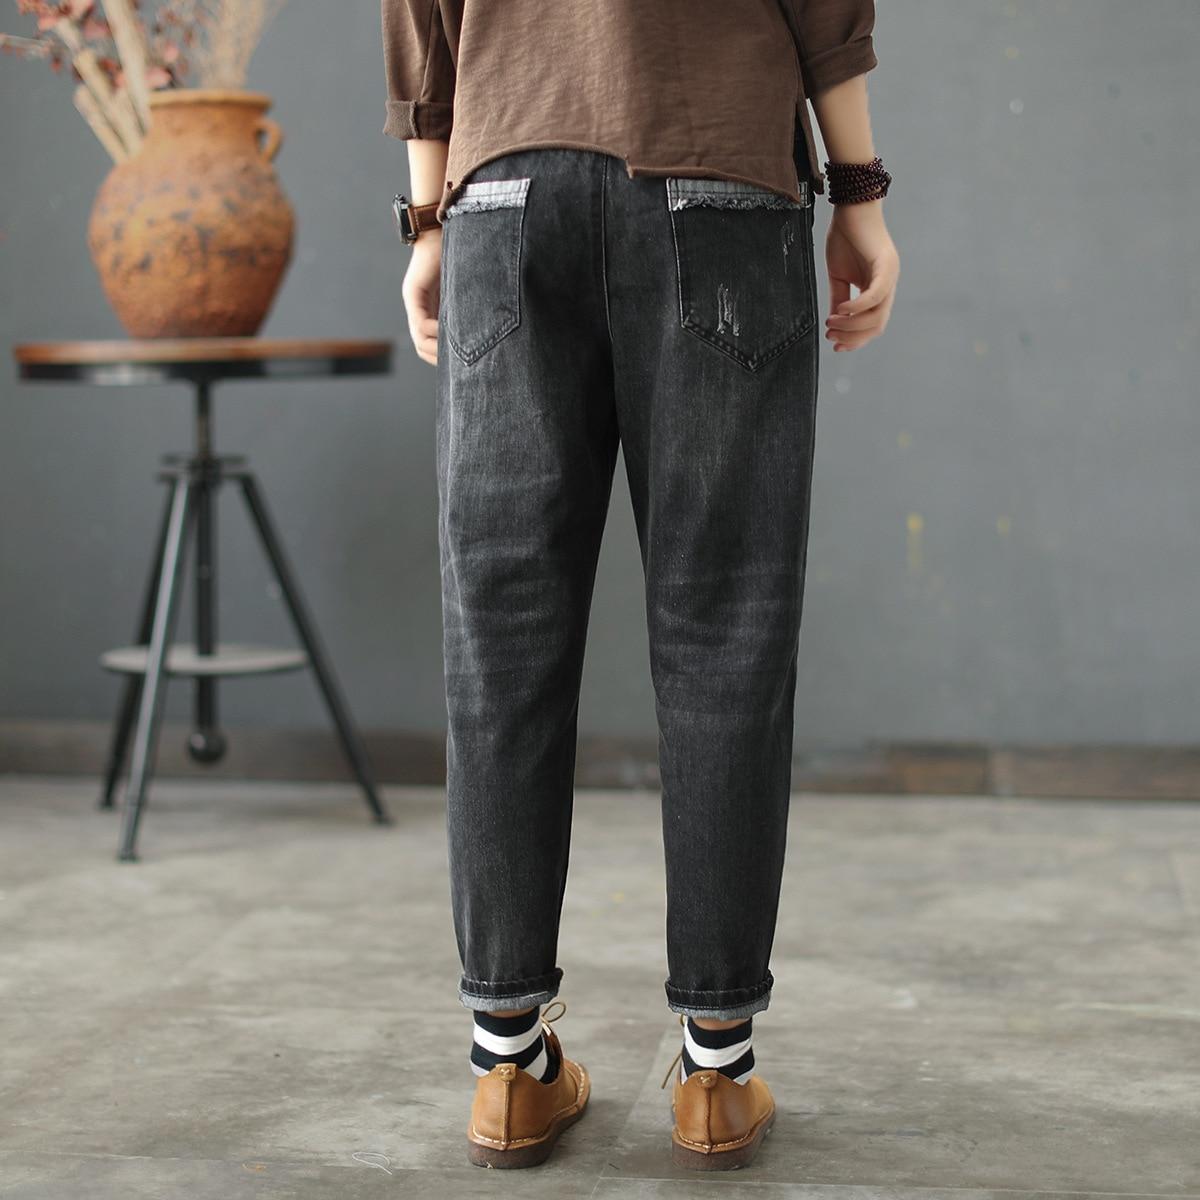 Pantalones Negro Sen Harem Retro Femenina Jeans Literario Desgastados Patch Lavado Elástico Encaje Cintura Pies Línea wq0aa6I